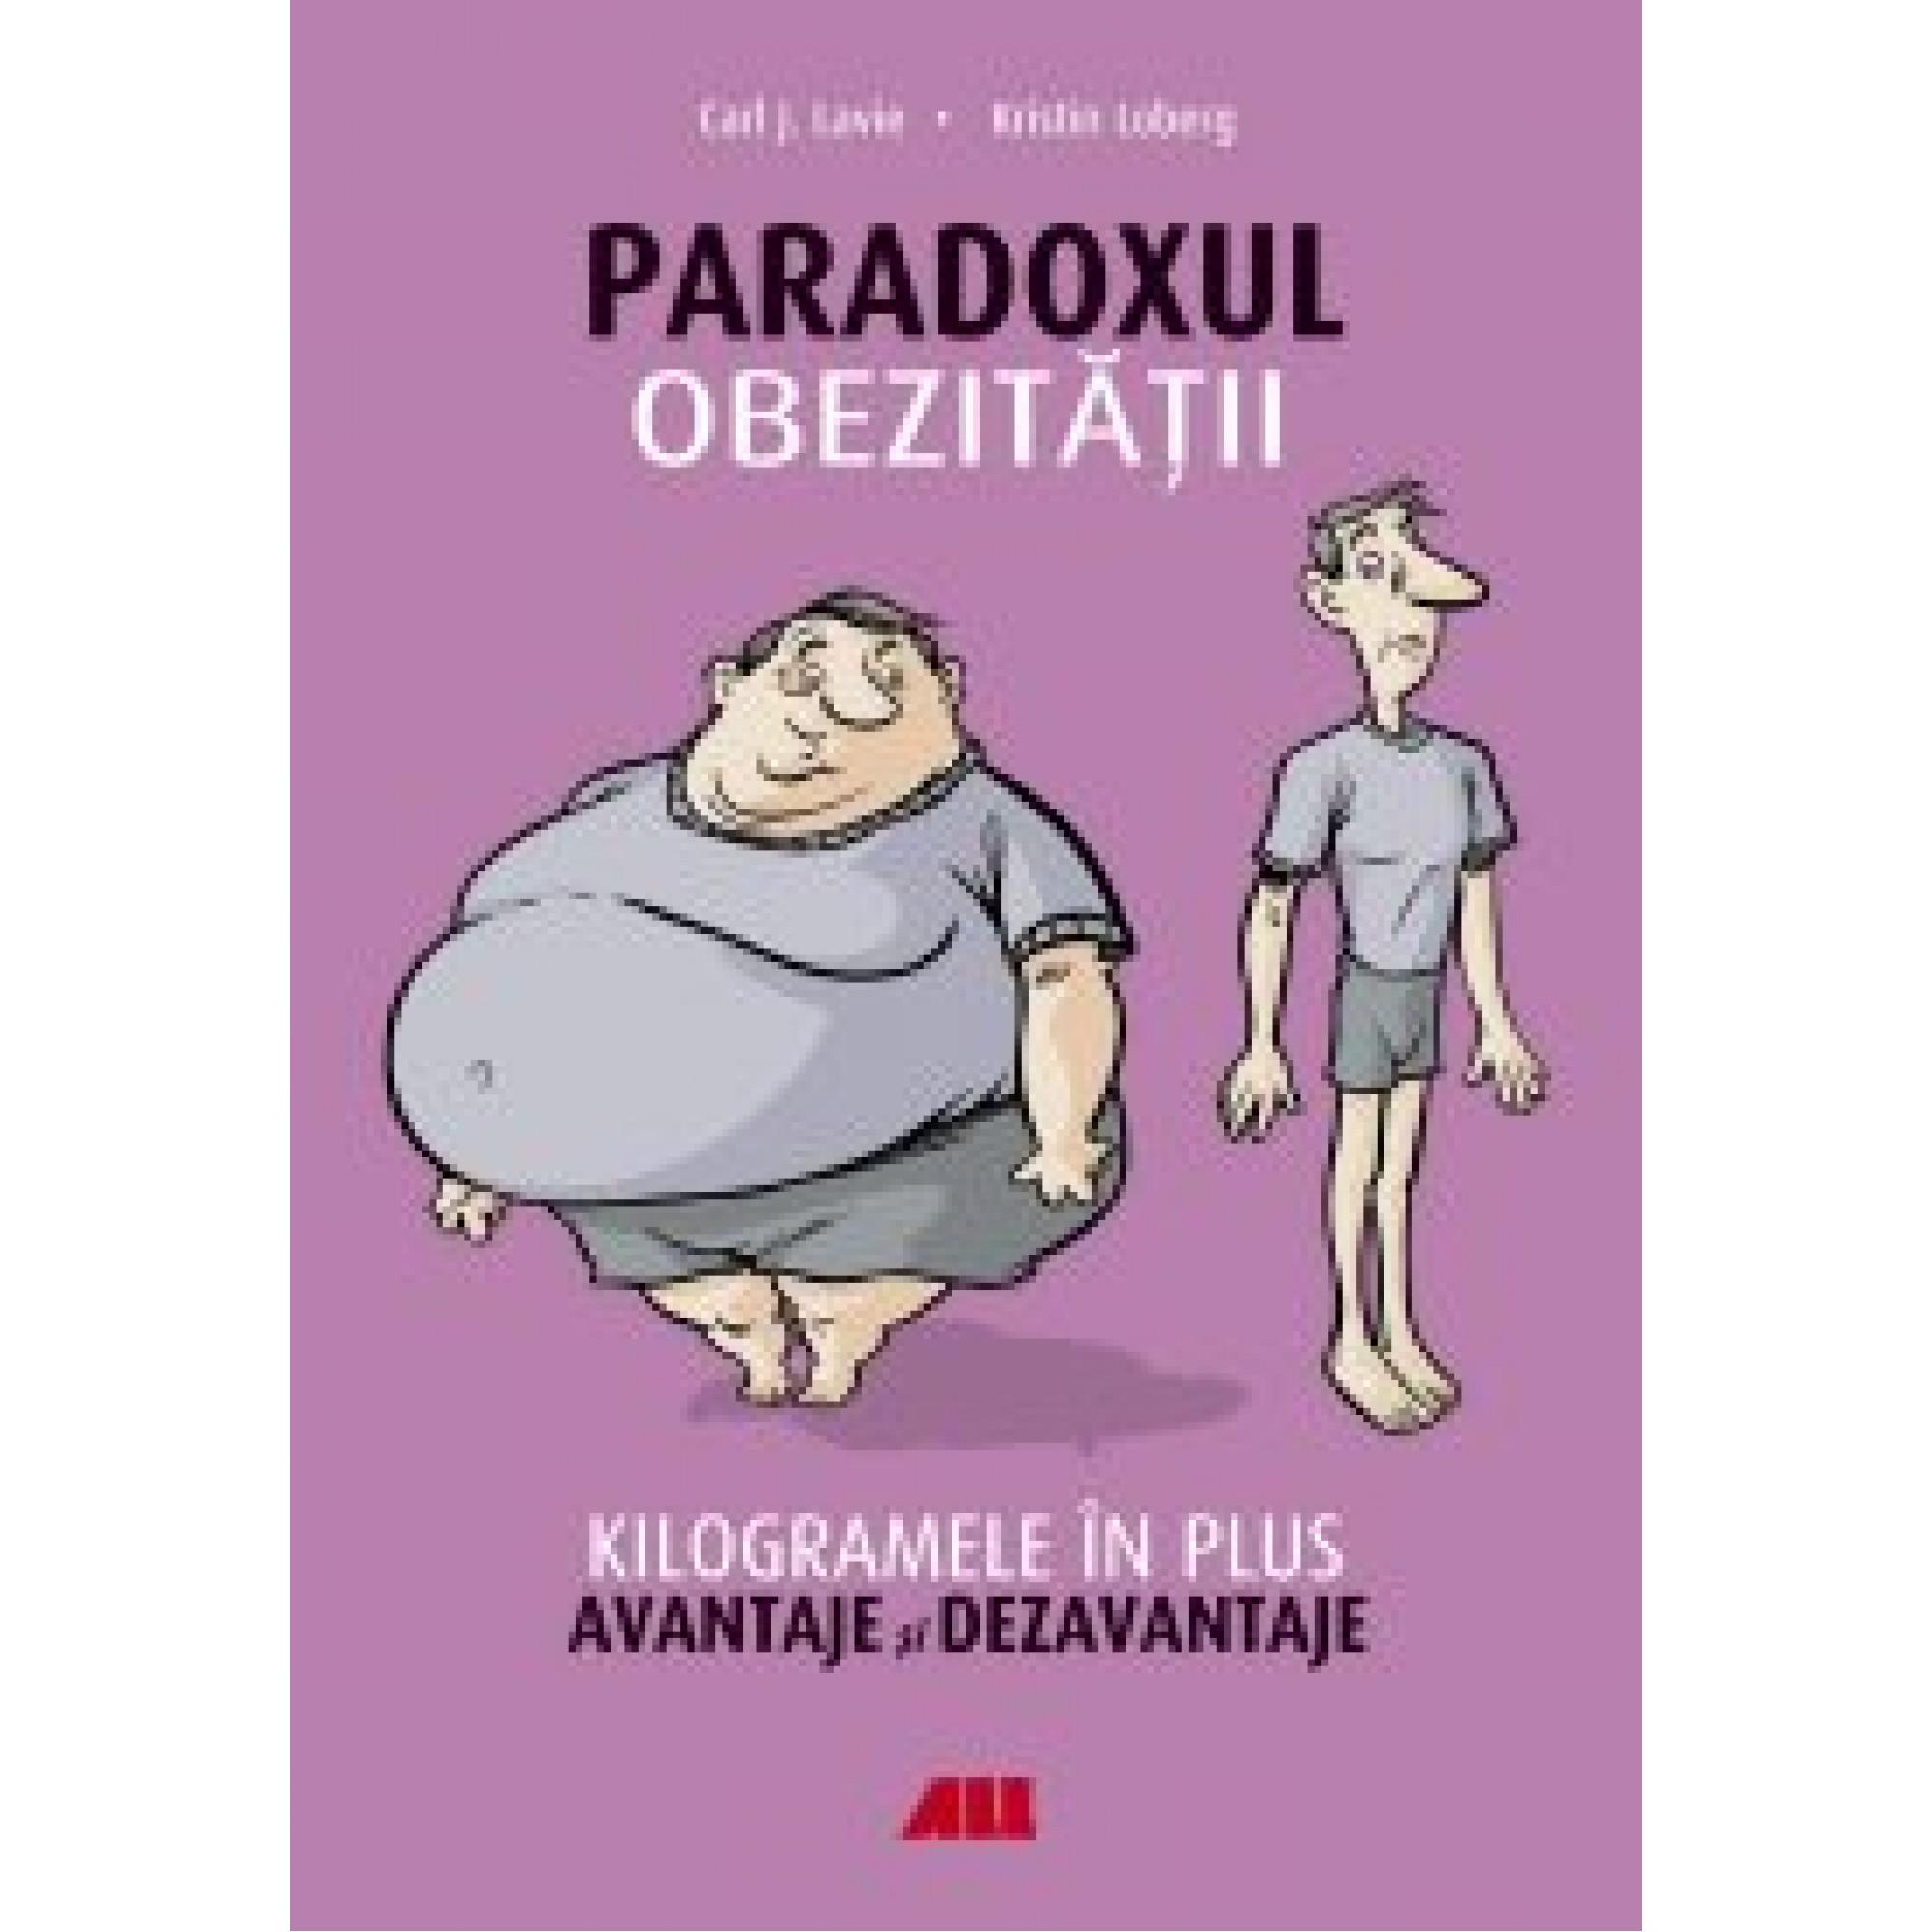 Paradoxul obezității; Carl J. Lavie, Kristin Loberg